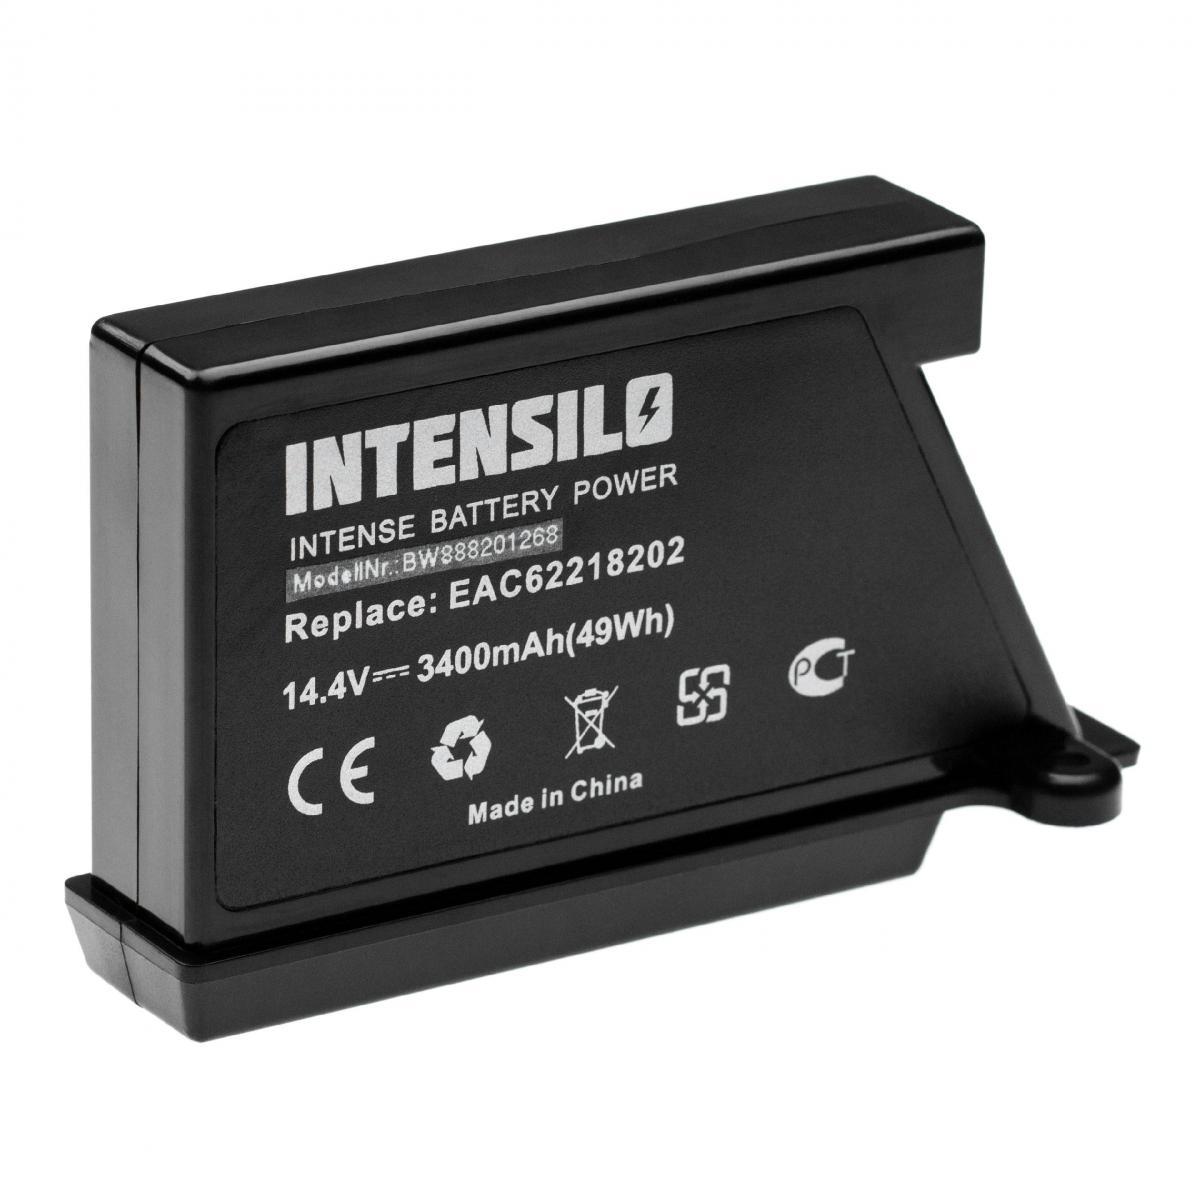 Vhbw INTENSILO Batterie compatible avec LG HOM-BOT VR64701LVMP, VR64702LVMB, VR64702LVMP robot électroménager (3400mAh, 14,4V